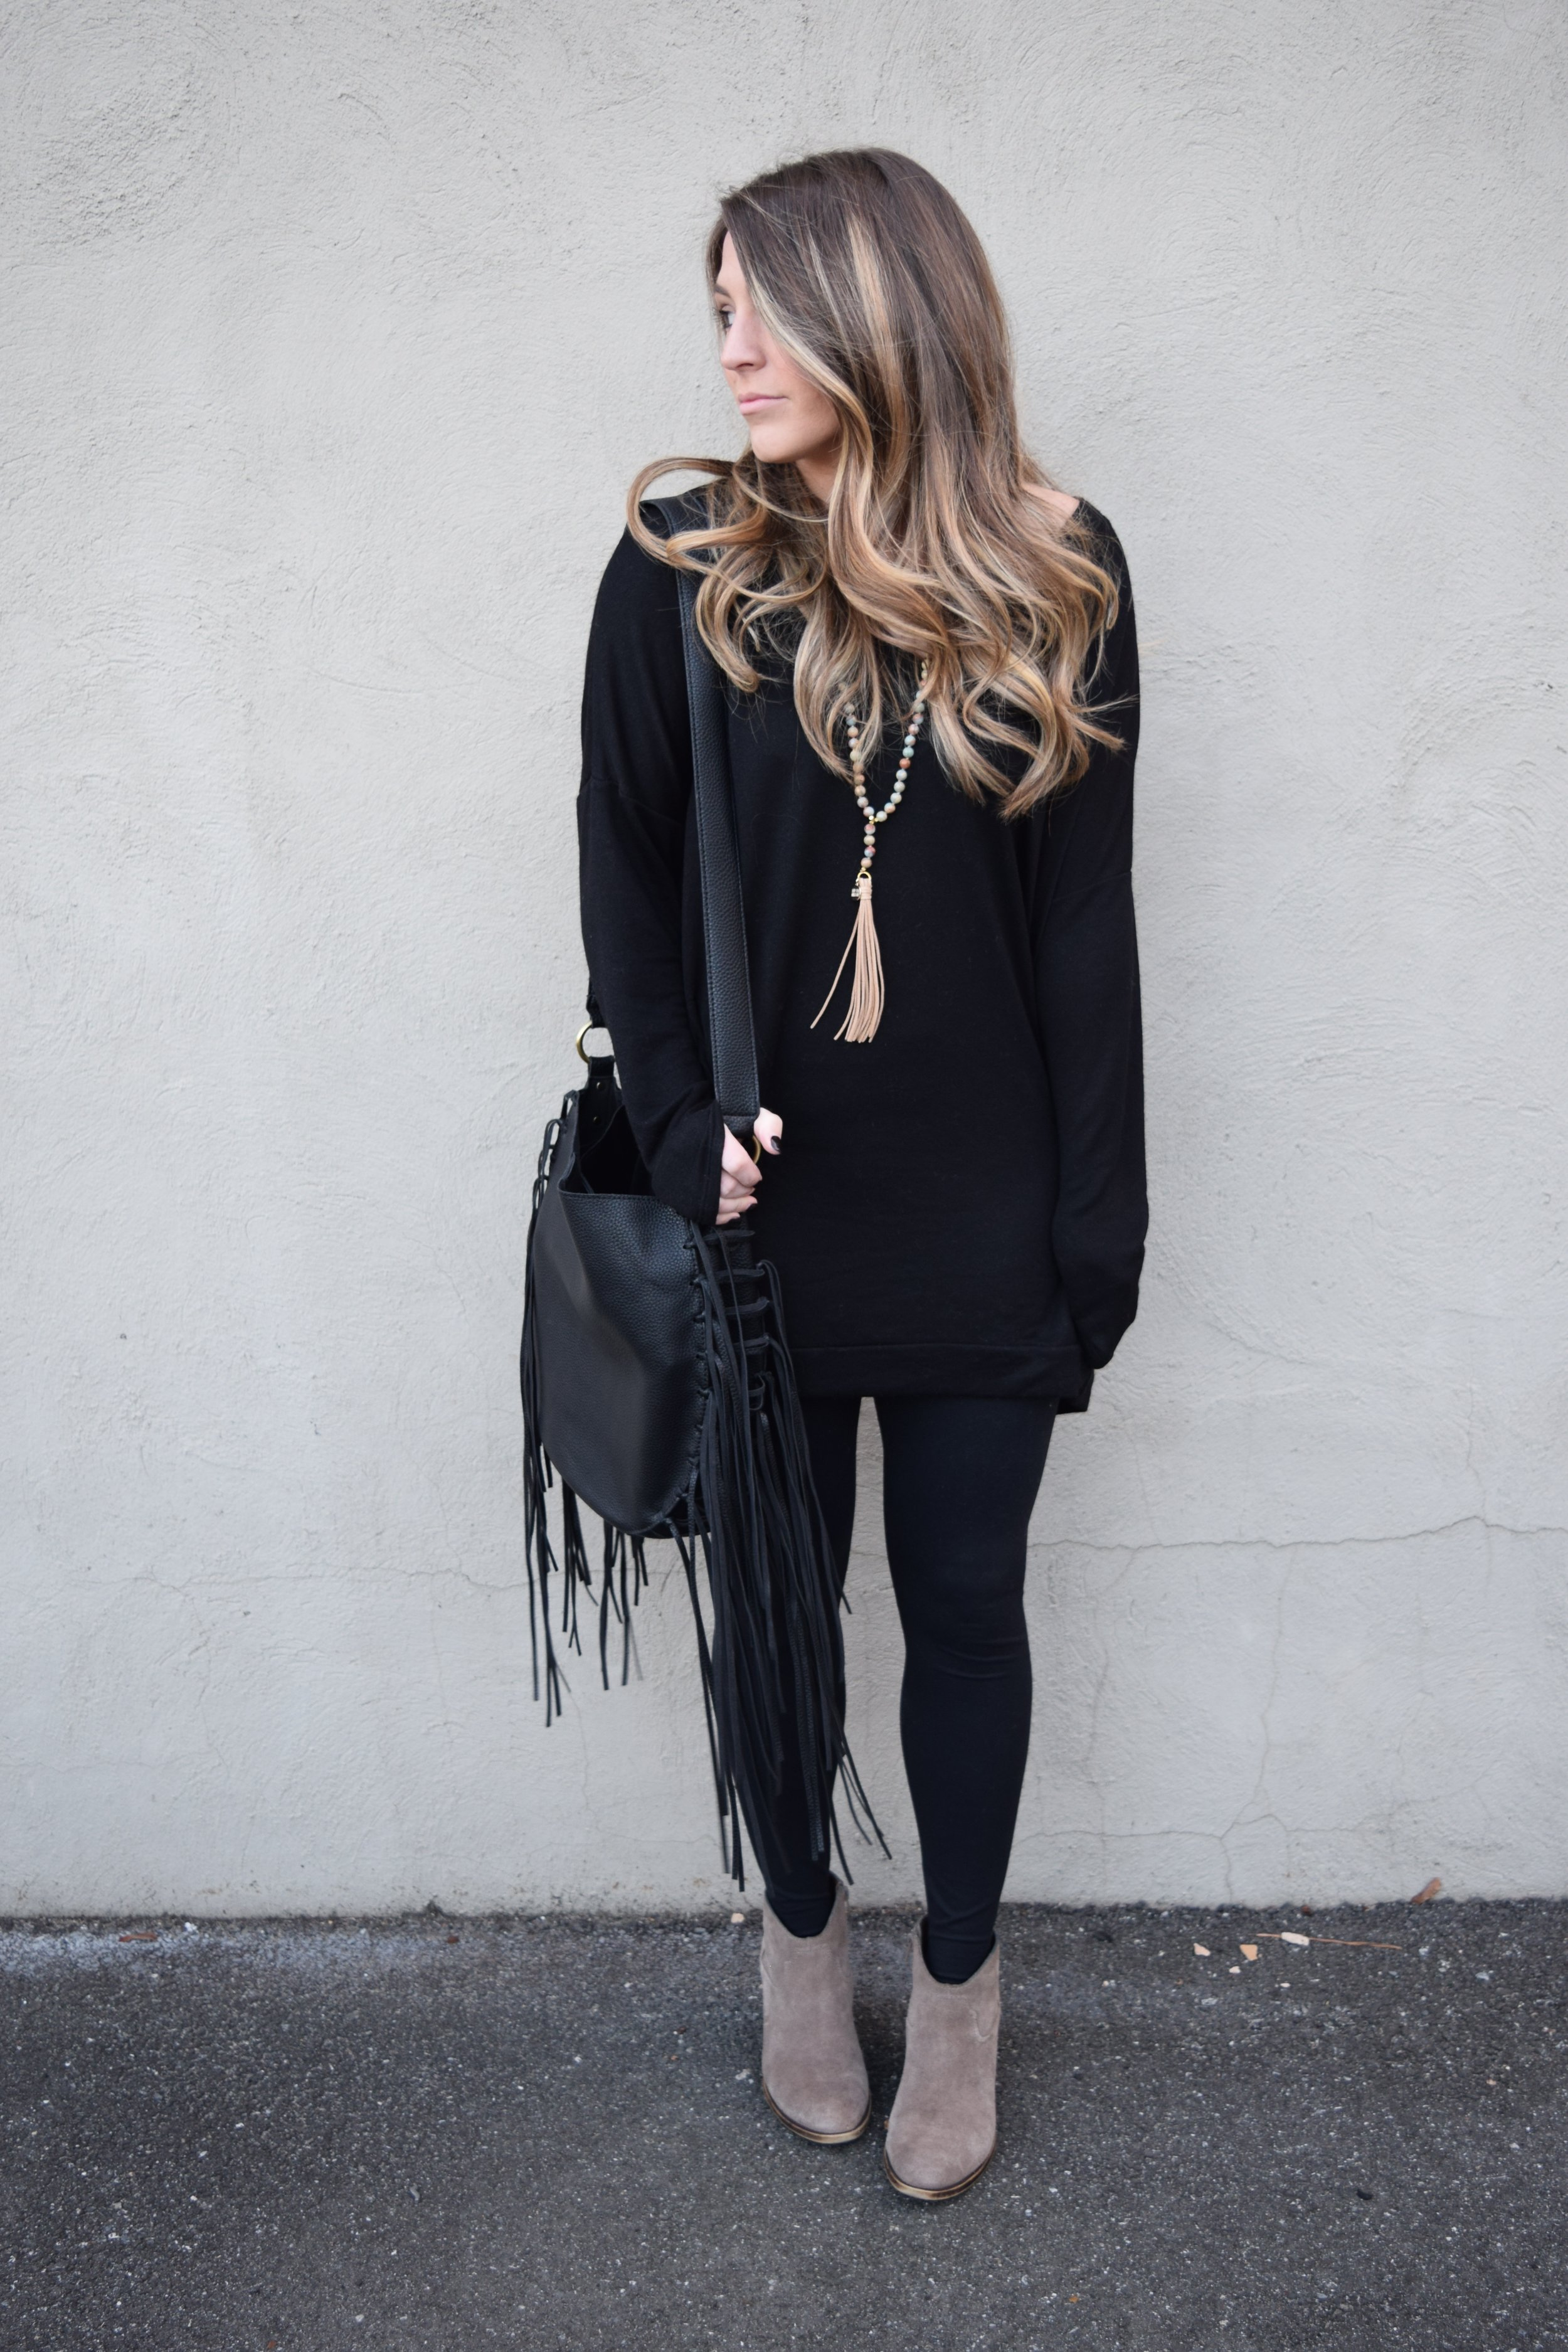 winter outfit inspo // pinebarrenbeauty.com